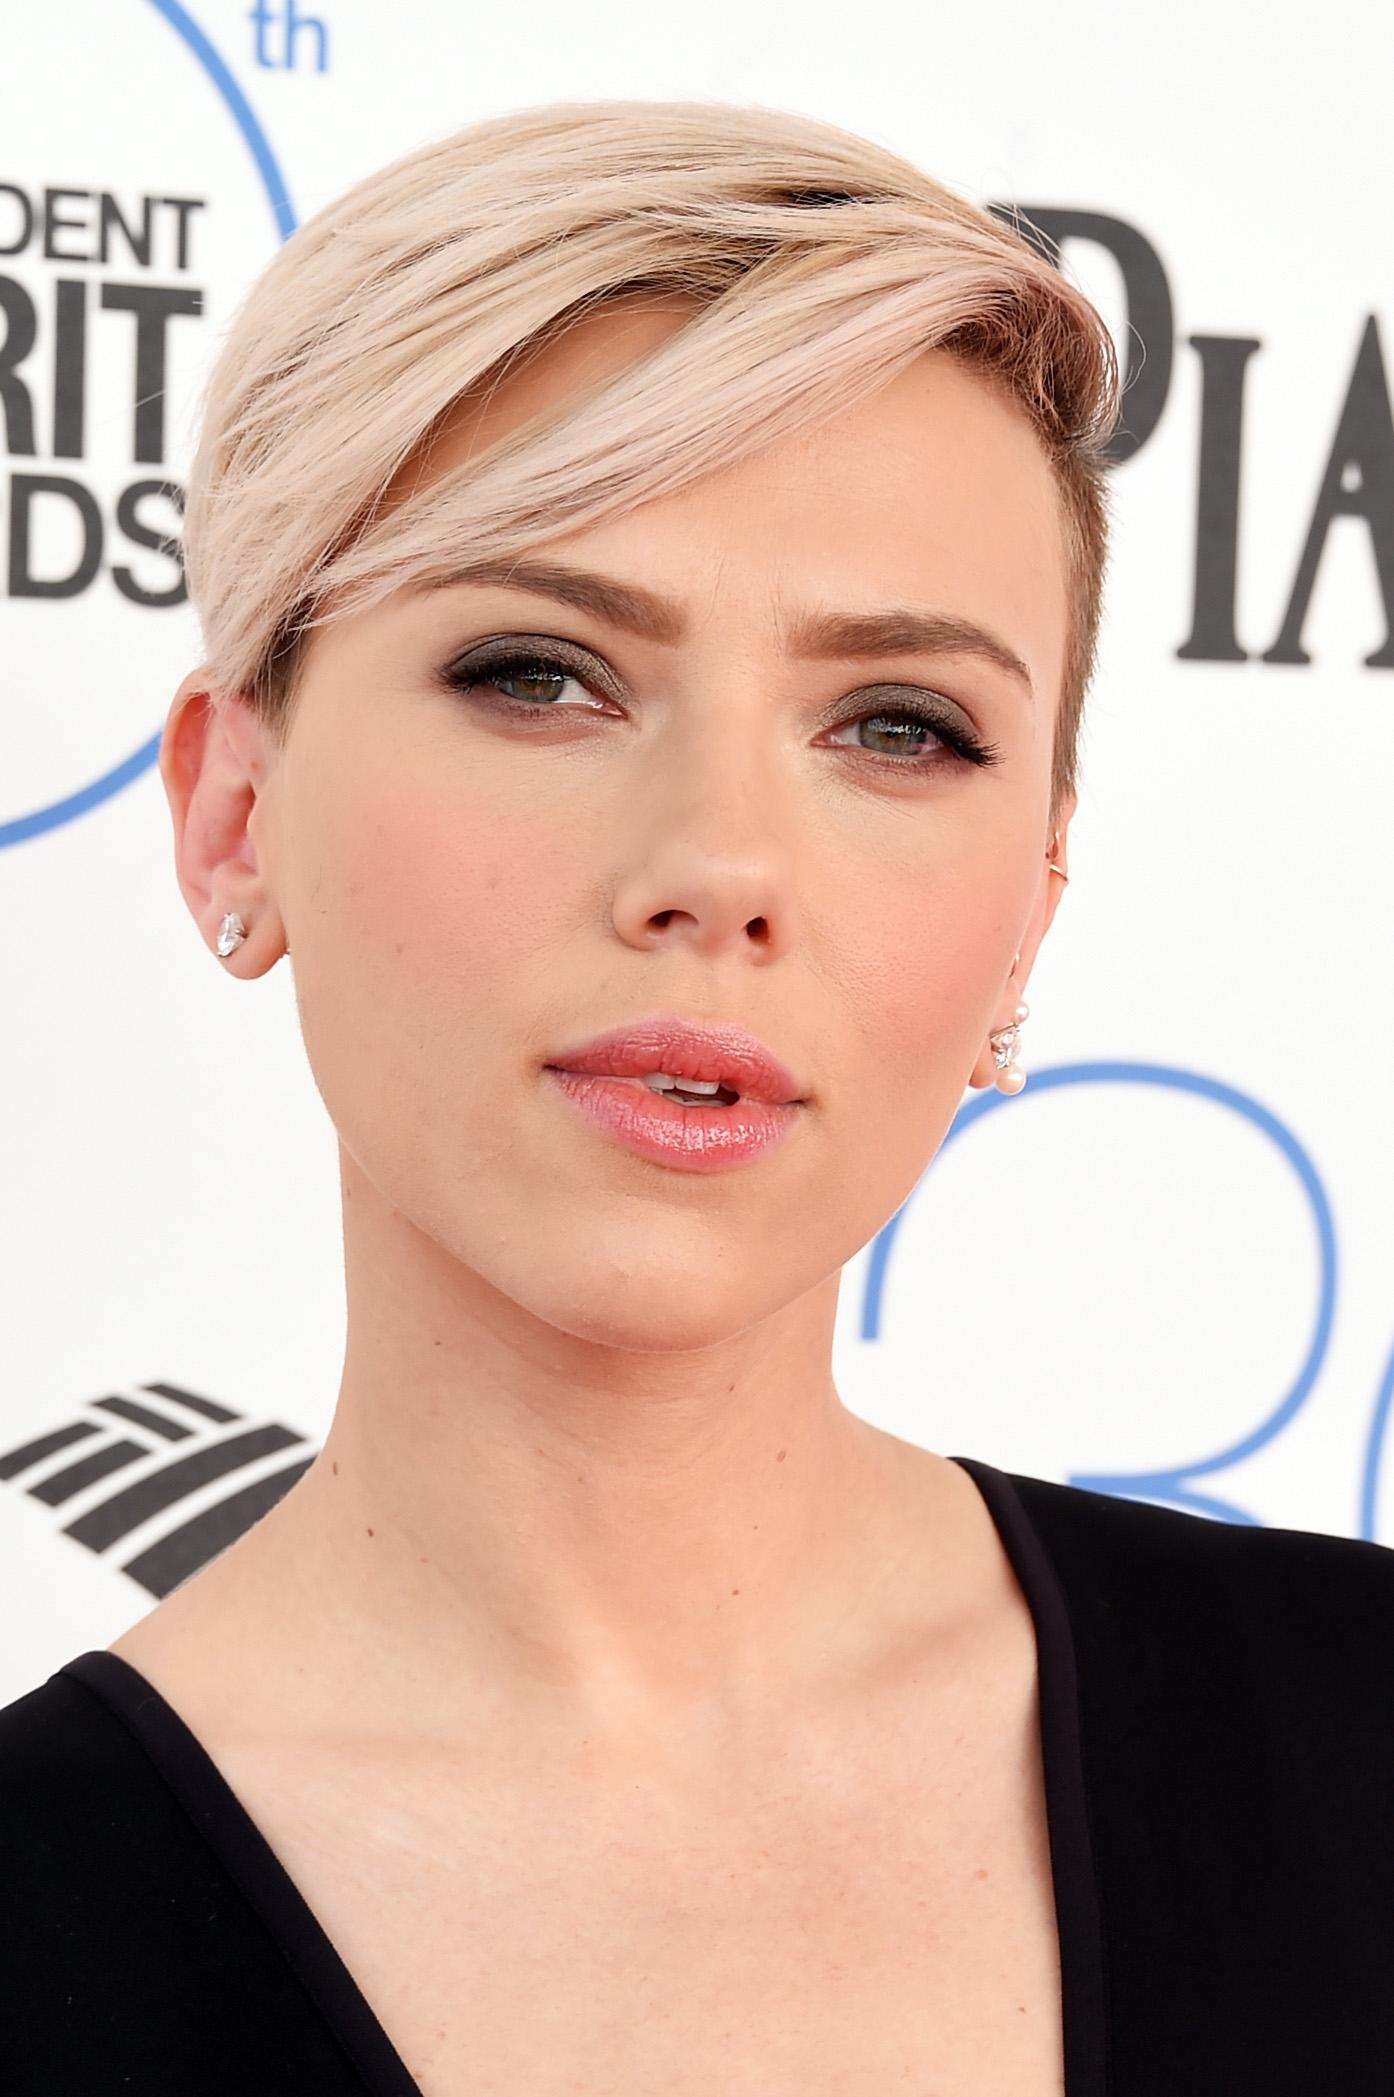 SANTA MONICA, CA - FEBRUARY 21:  Actress Scarlett Johansson attends the 2015 Film Independent Spirit Awards at Santa Monica Beach on February 21, 2015 in Santa Monica, California.  (Photo by Jason Merritt/Getty Images)